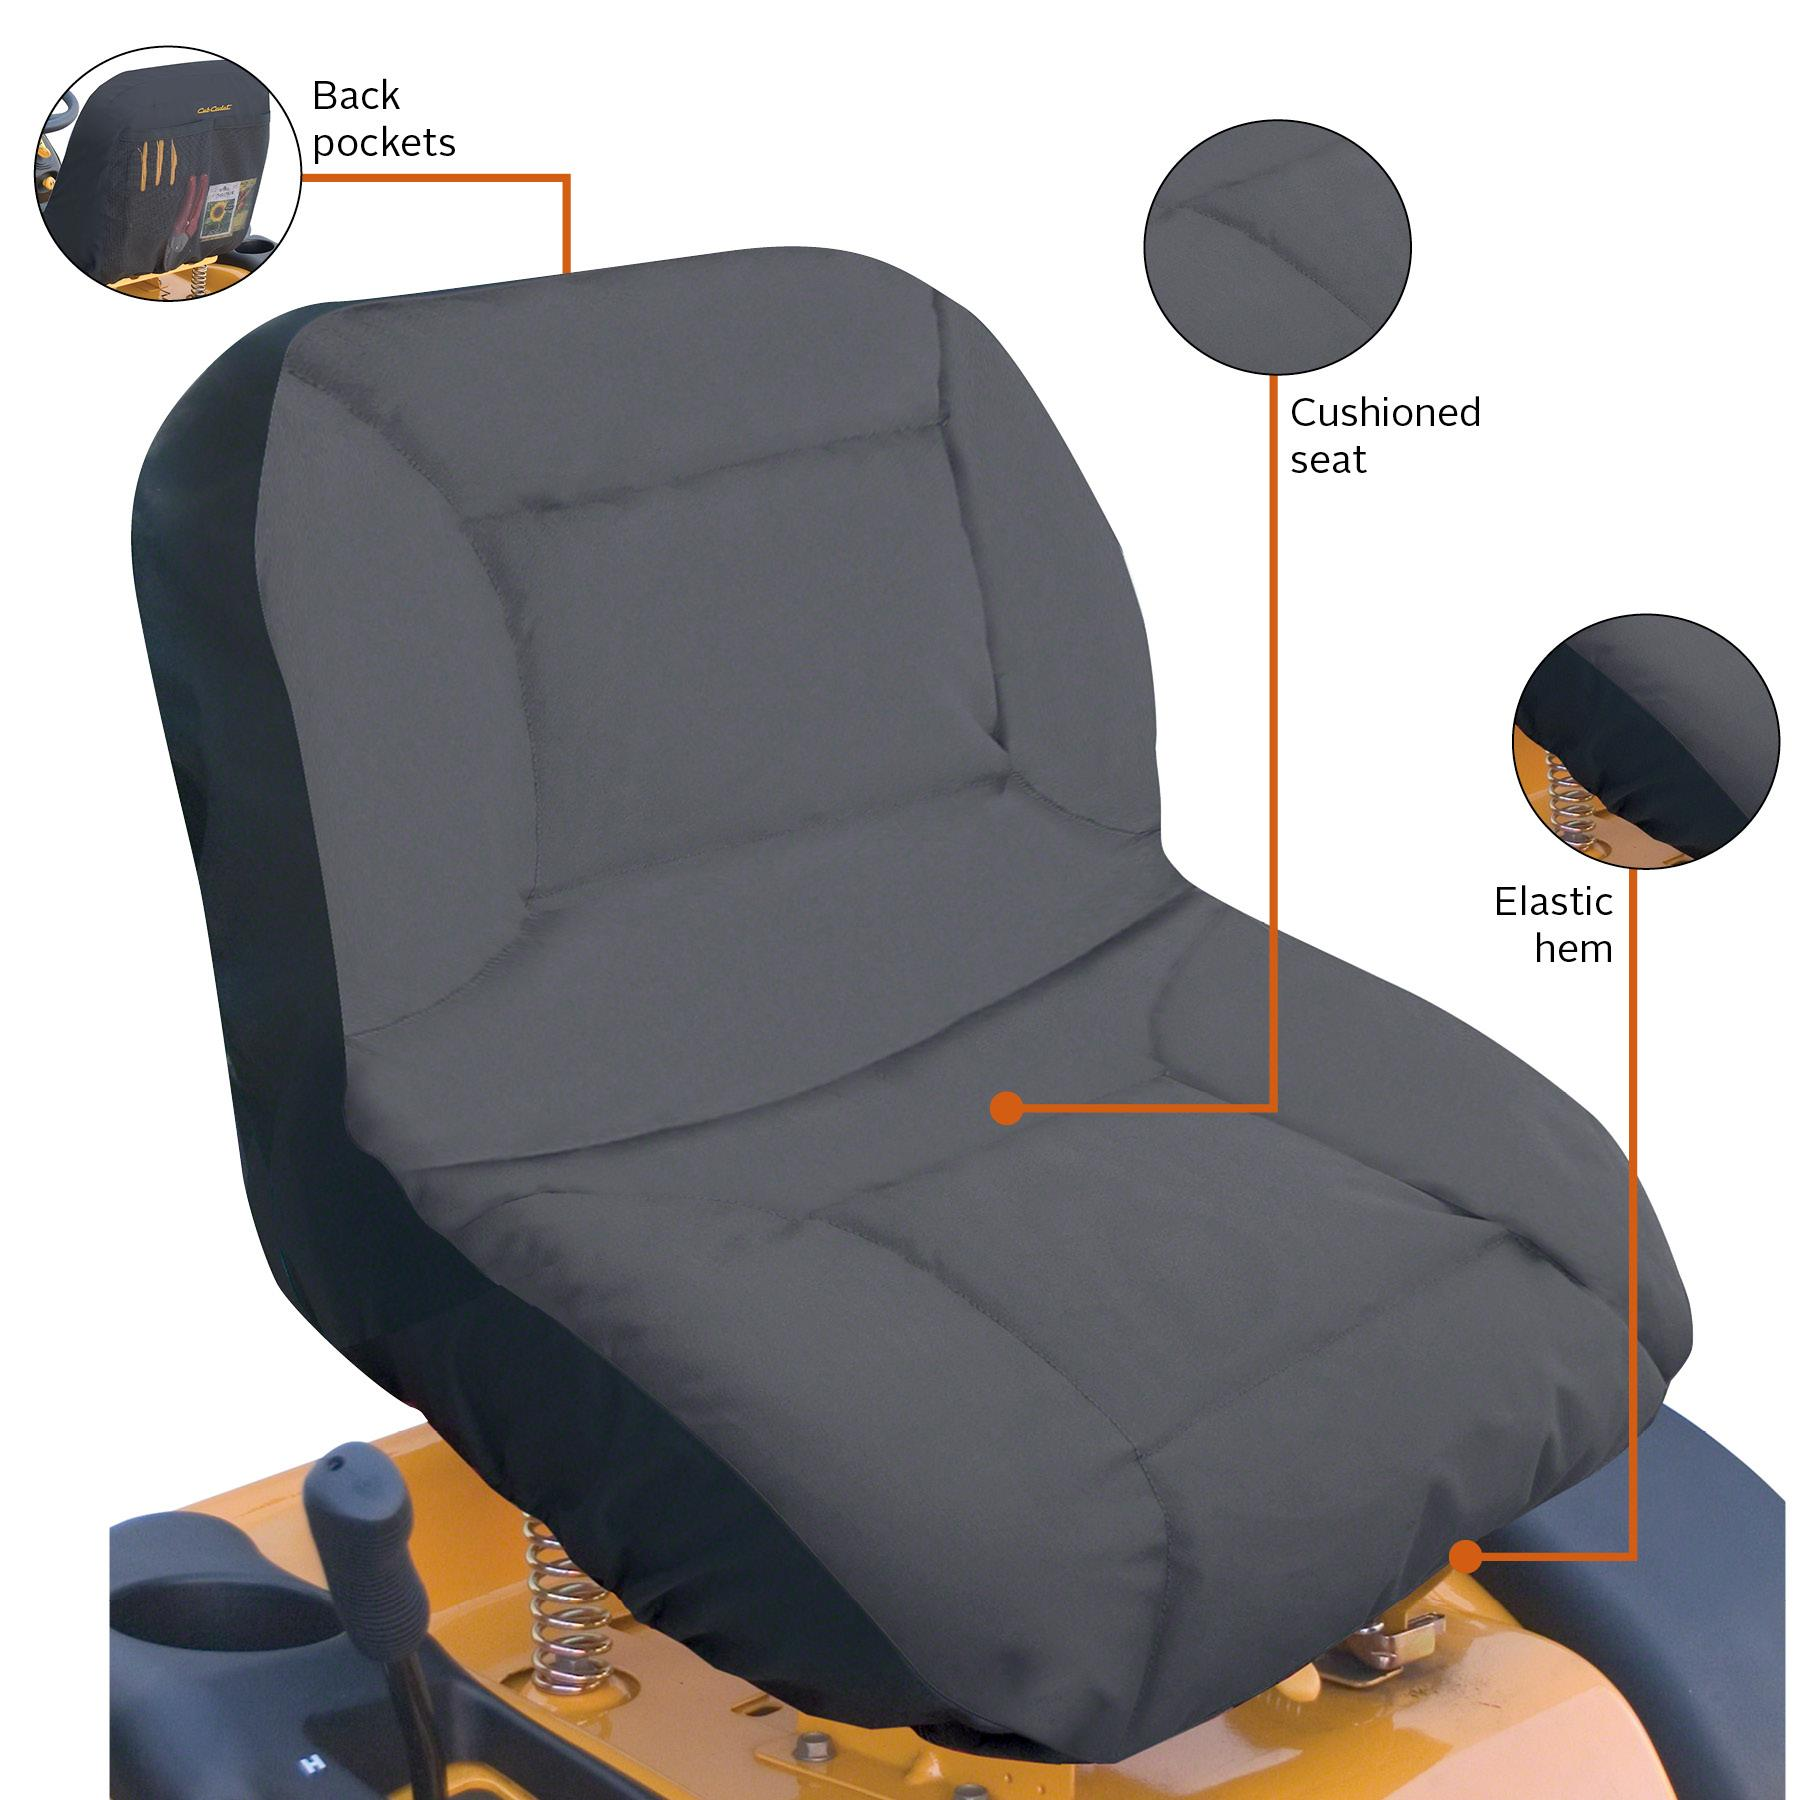 Cub Cadet Tractor Seat : Classic accessories cub cadet lawn tractor seat